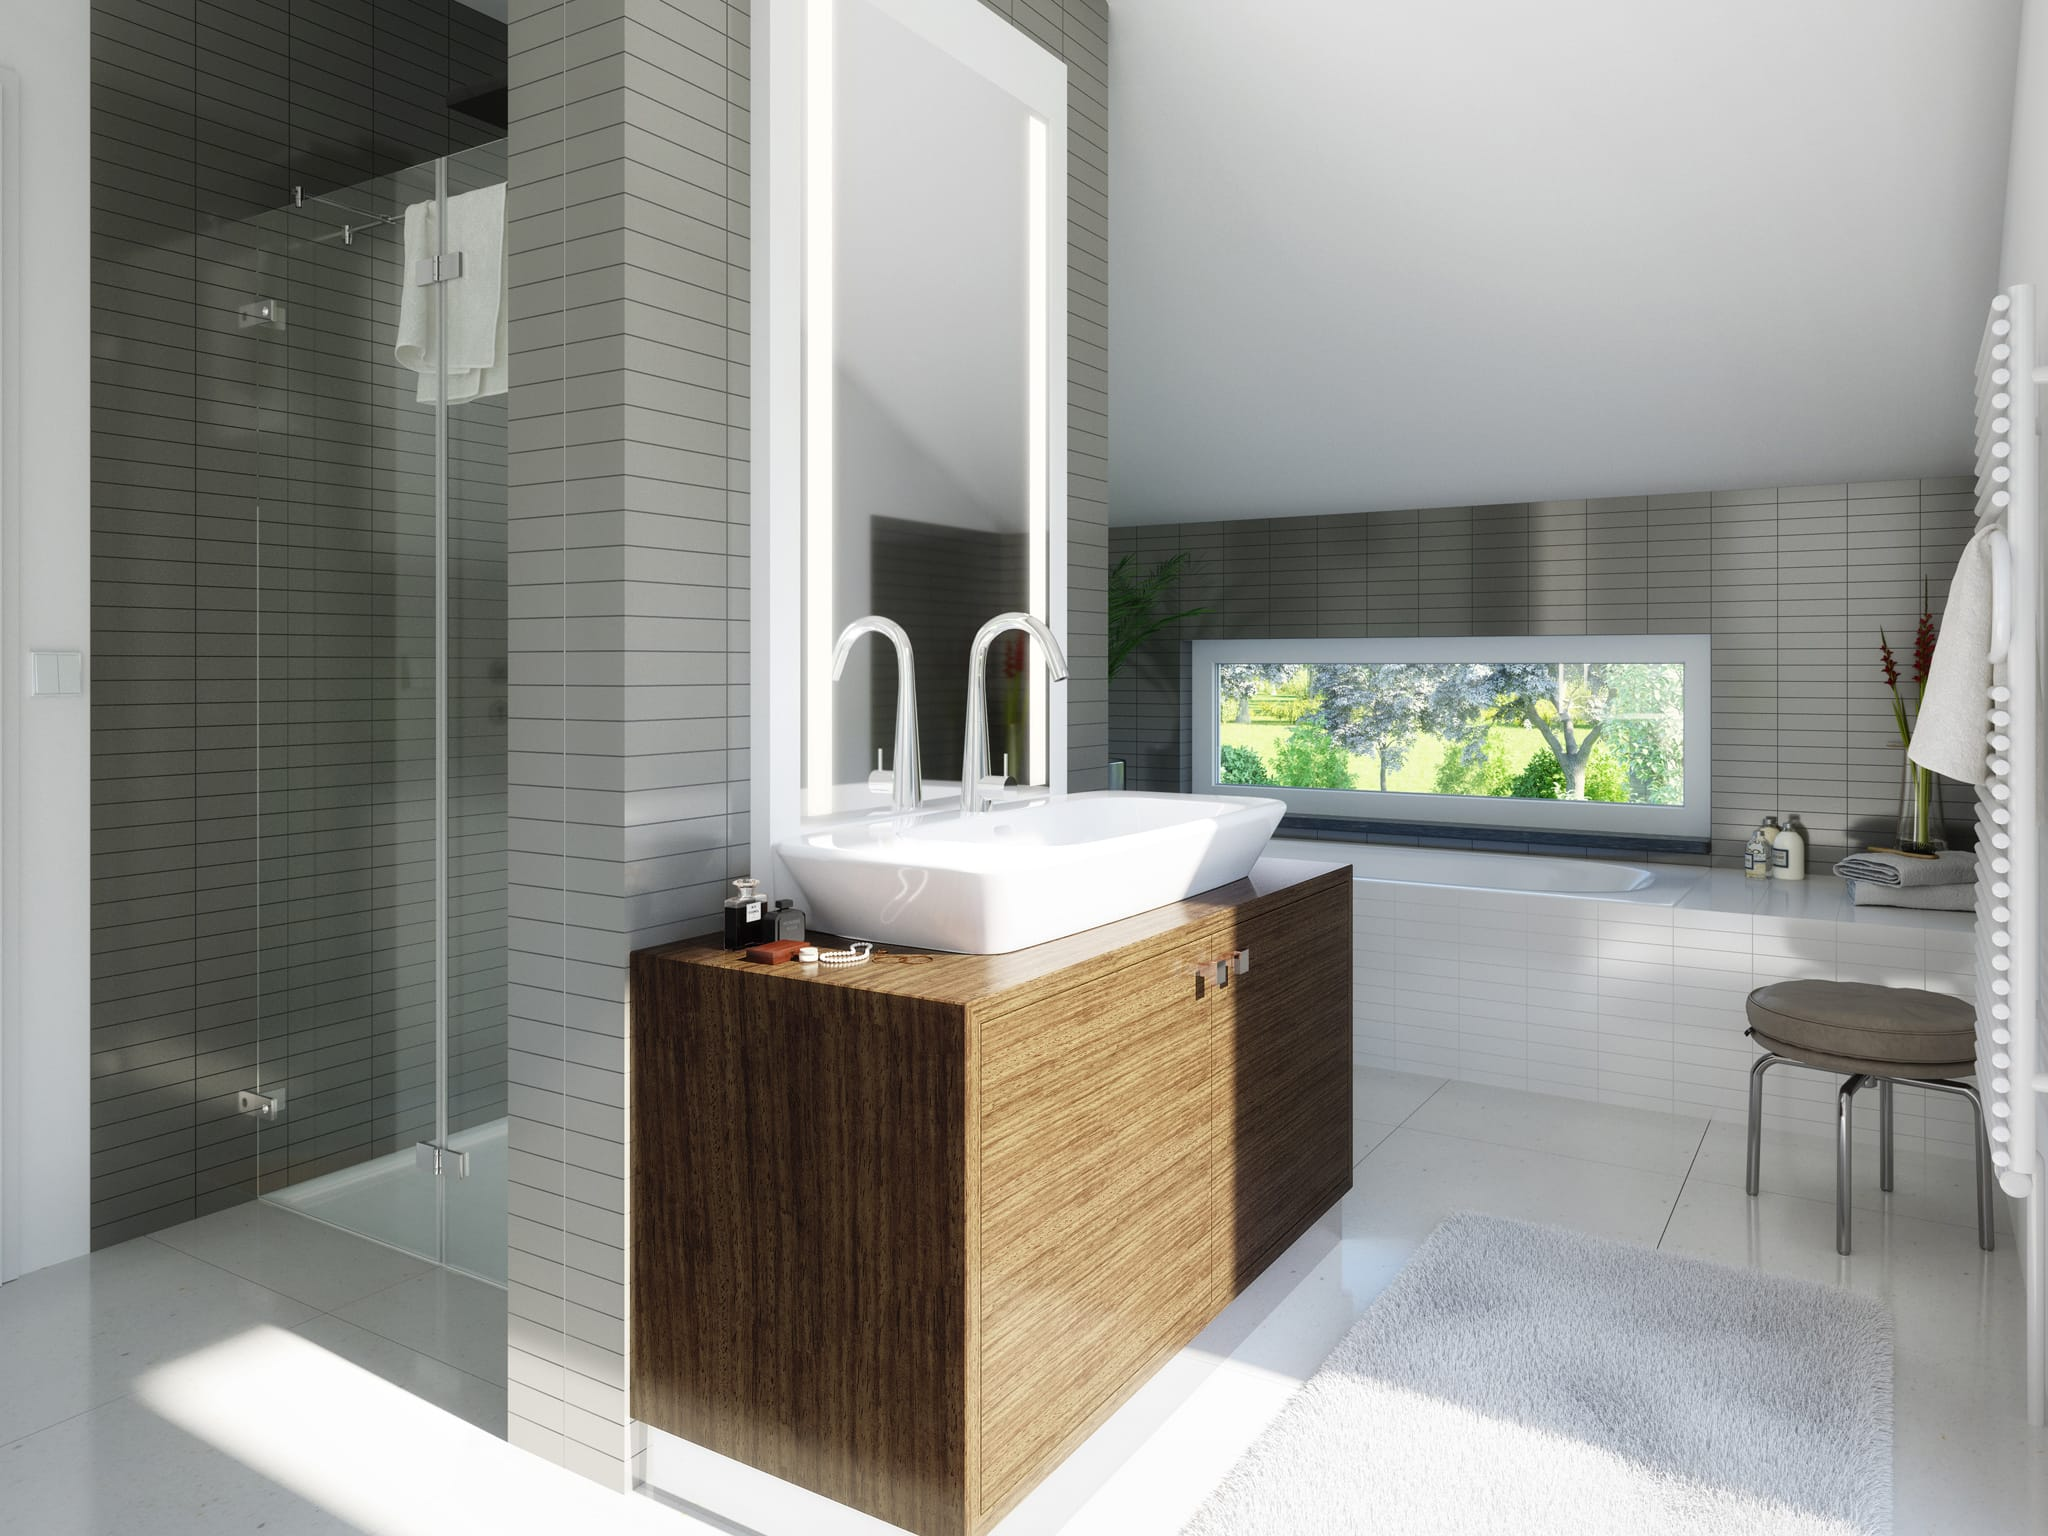 Badezimmer Ideen - Inneneinrichtung Fertighaus SUNSHINE 165 V3 von Living Haus - HausbauDirekt.de